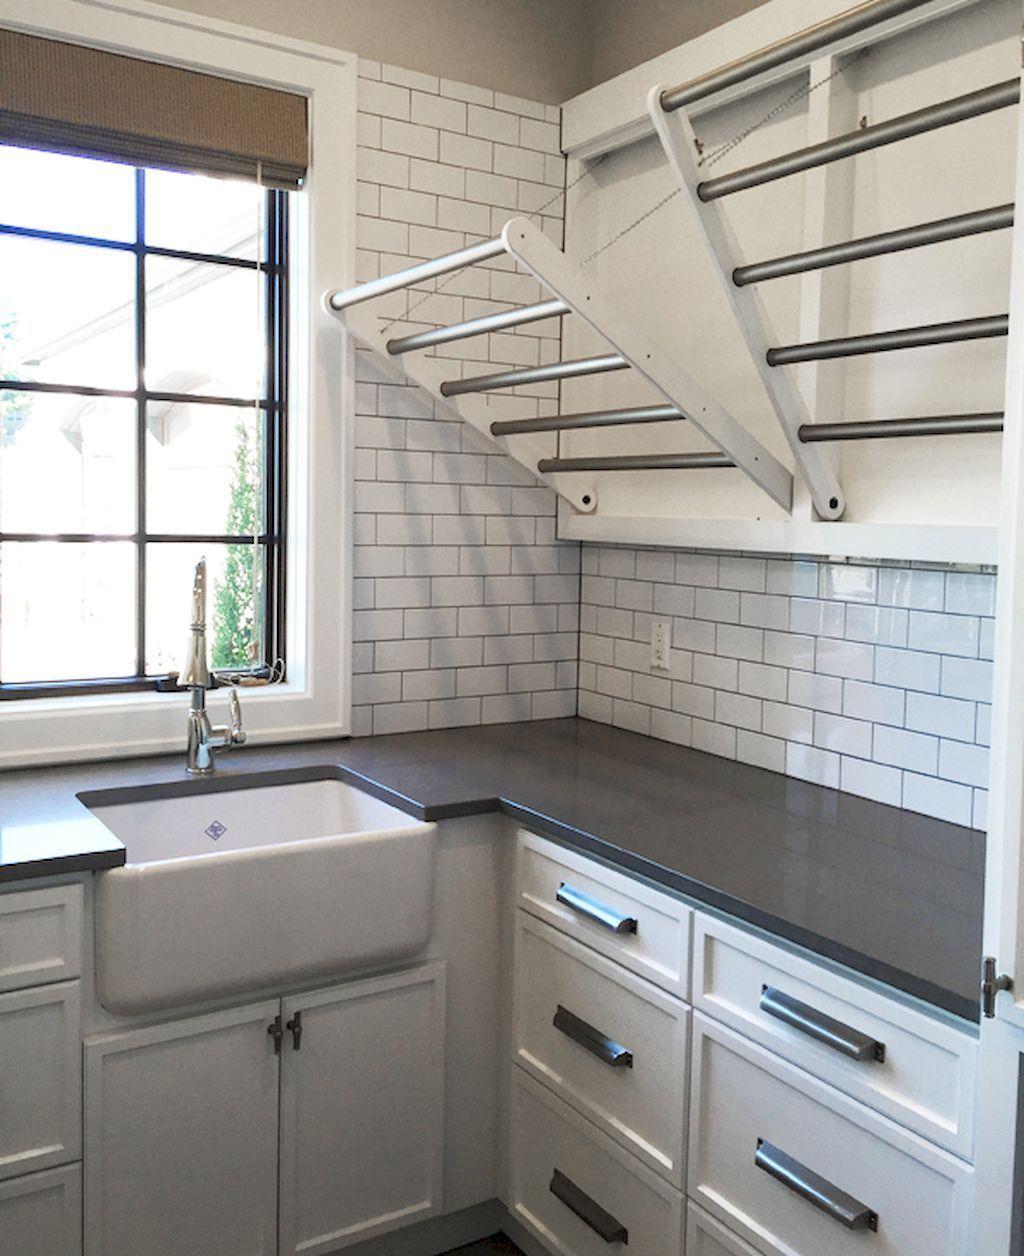 30+ Best Small Laundry Room Ideas and Photos on A Budget | Farmhouse ...